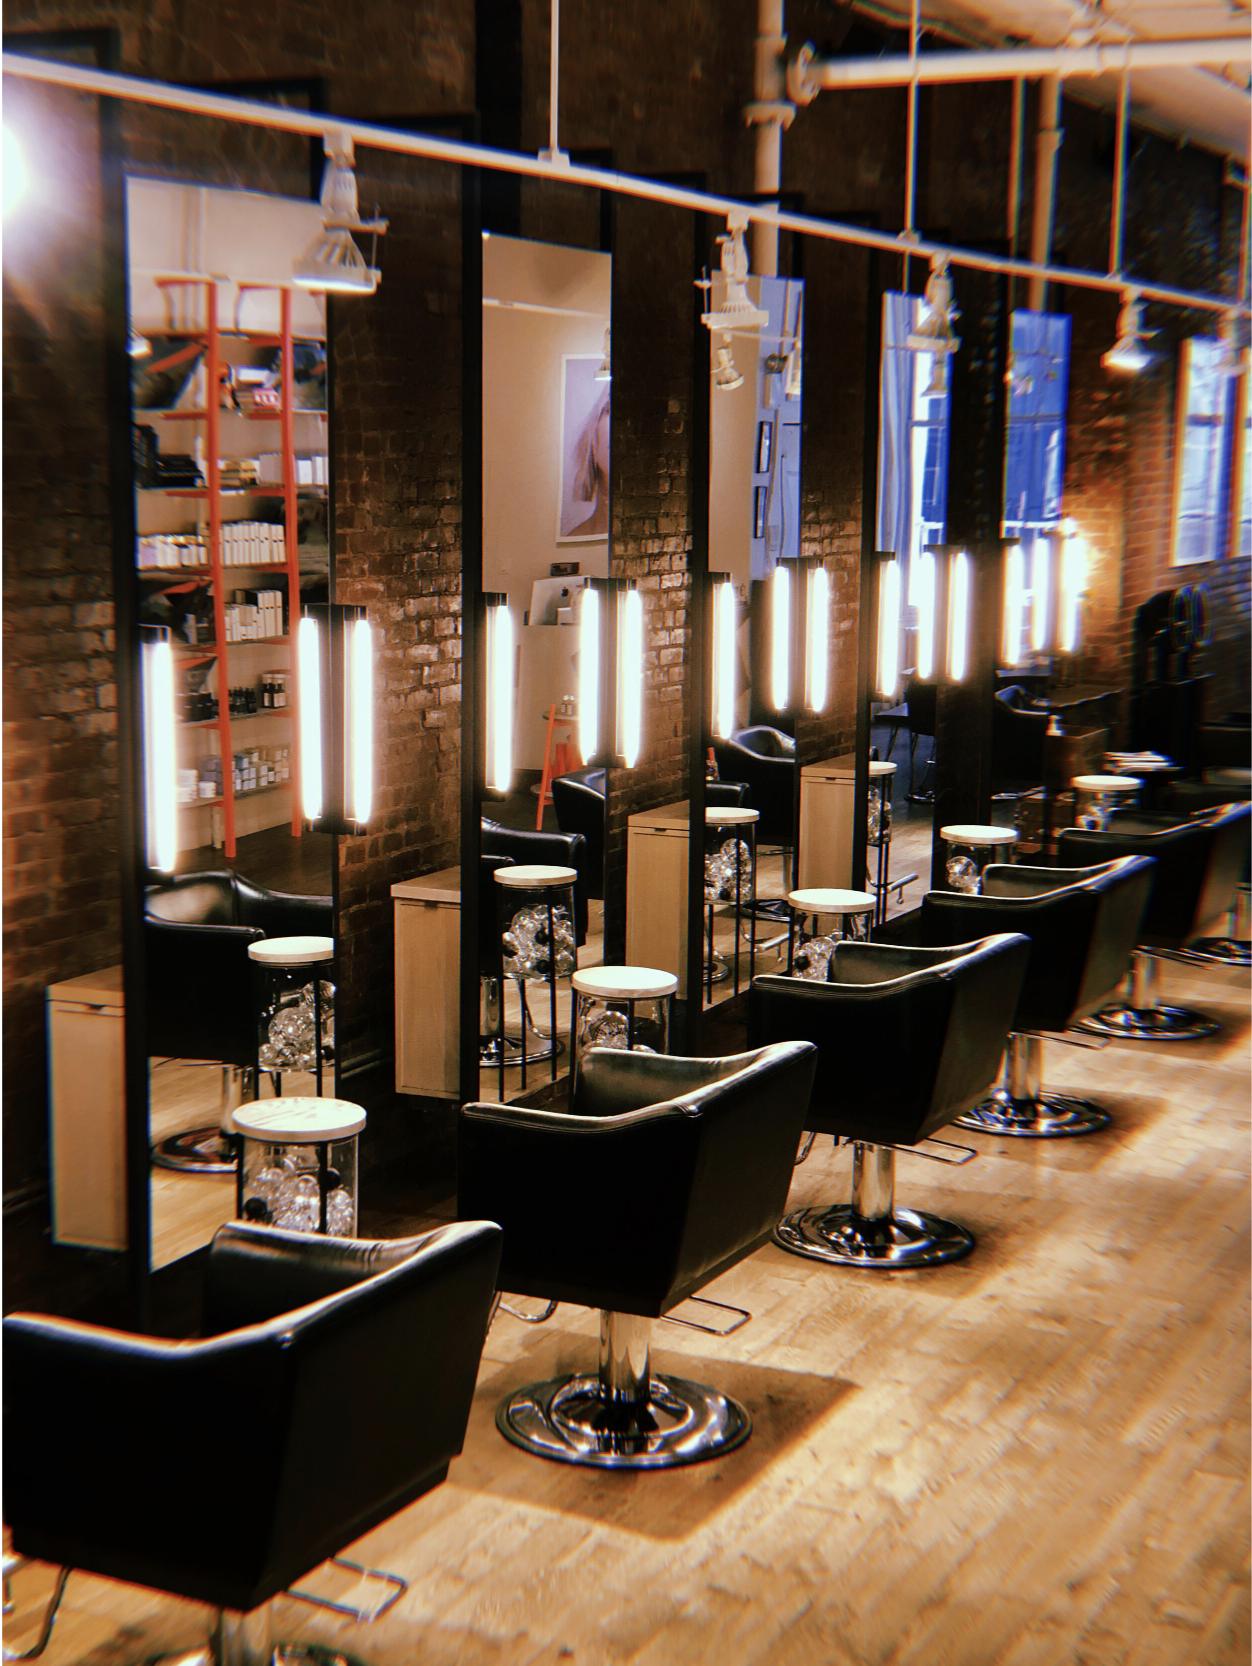 Salon Style New Yorkais online booking! - suite caroline